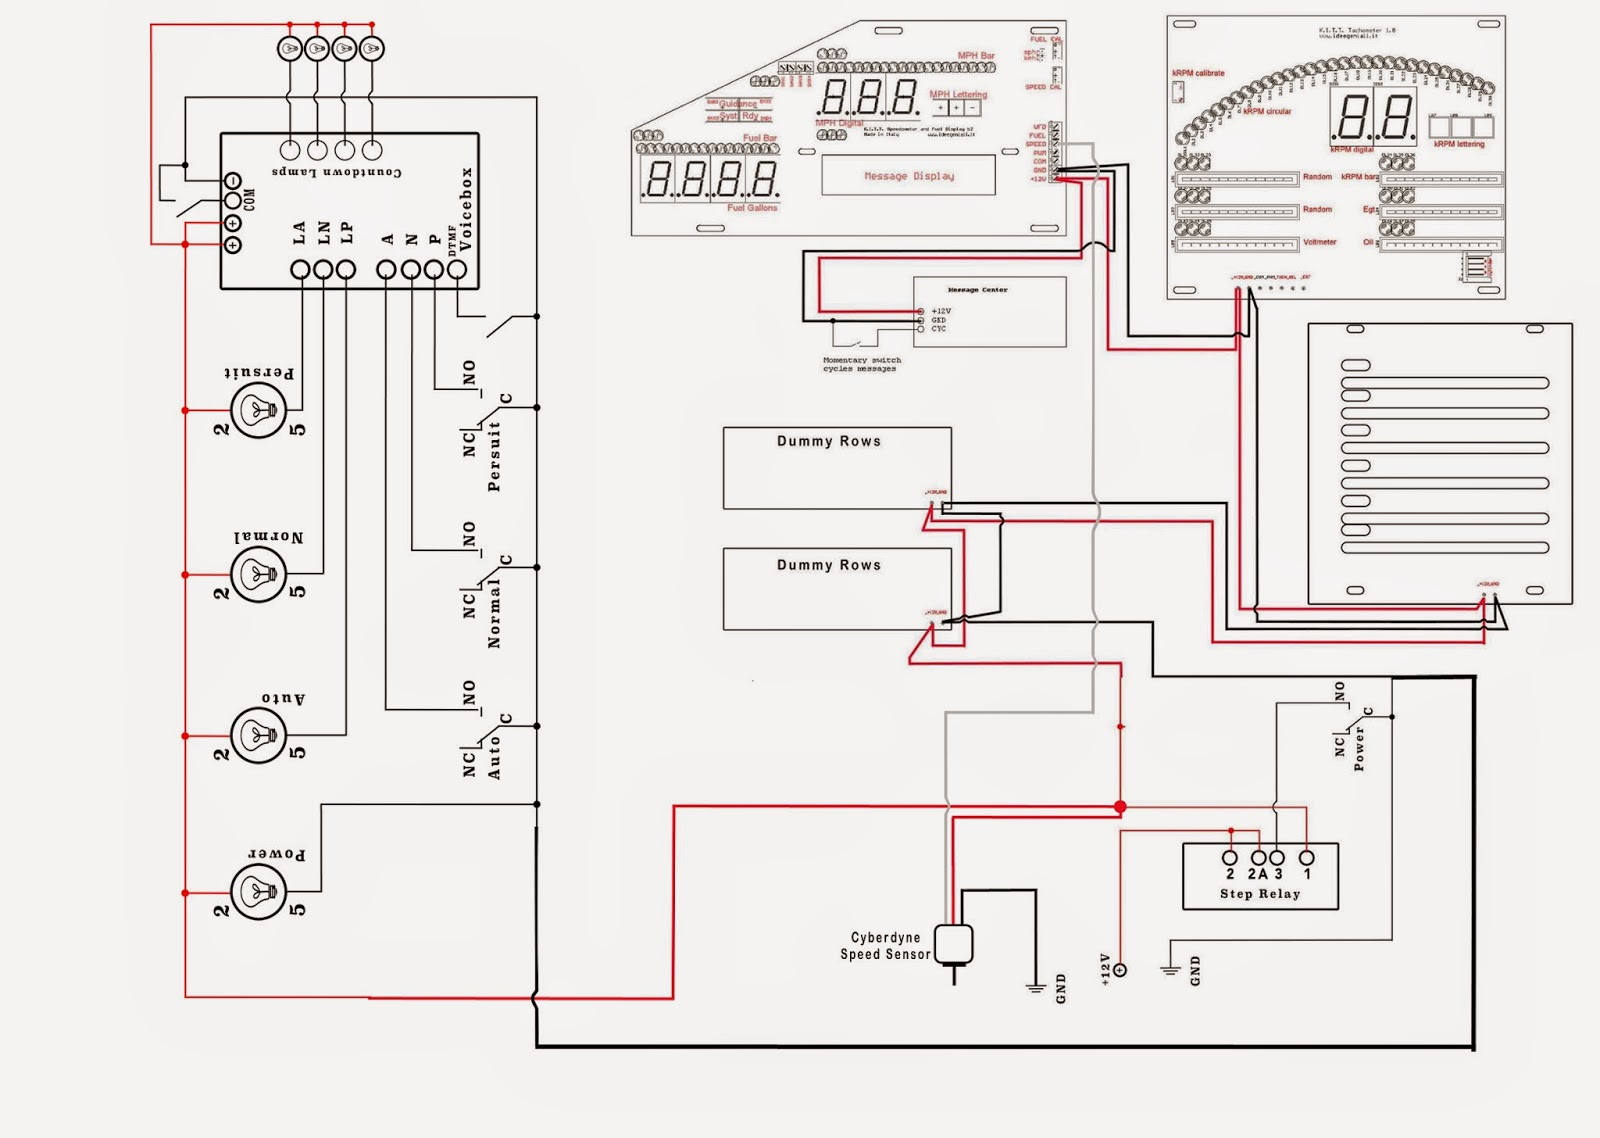 Quicksilver Battery Isolator Wiring Diagram Library Easy Diagrams I0 Wp Com 2 Bp Blogspot Gvfksg6qoo Vcqwcpdkc Multiple Multi